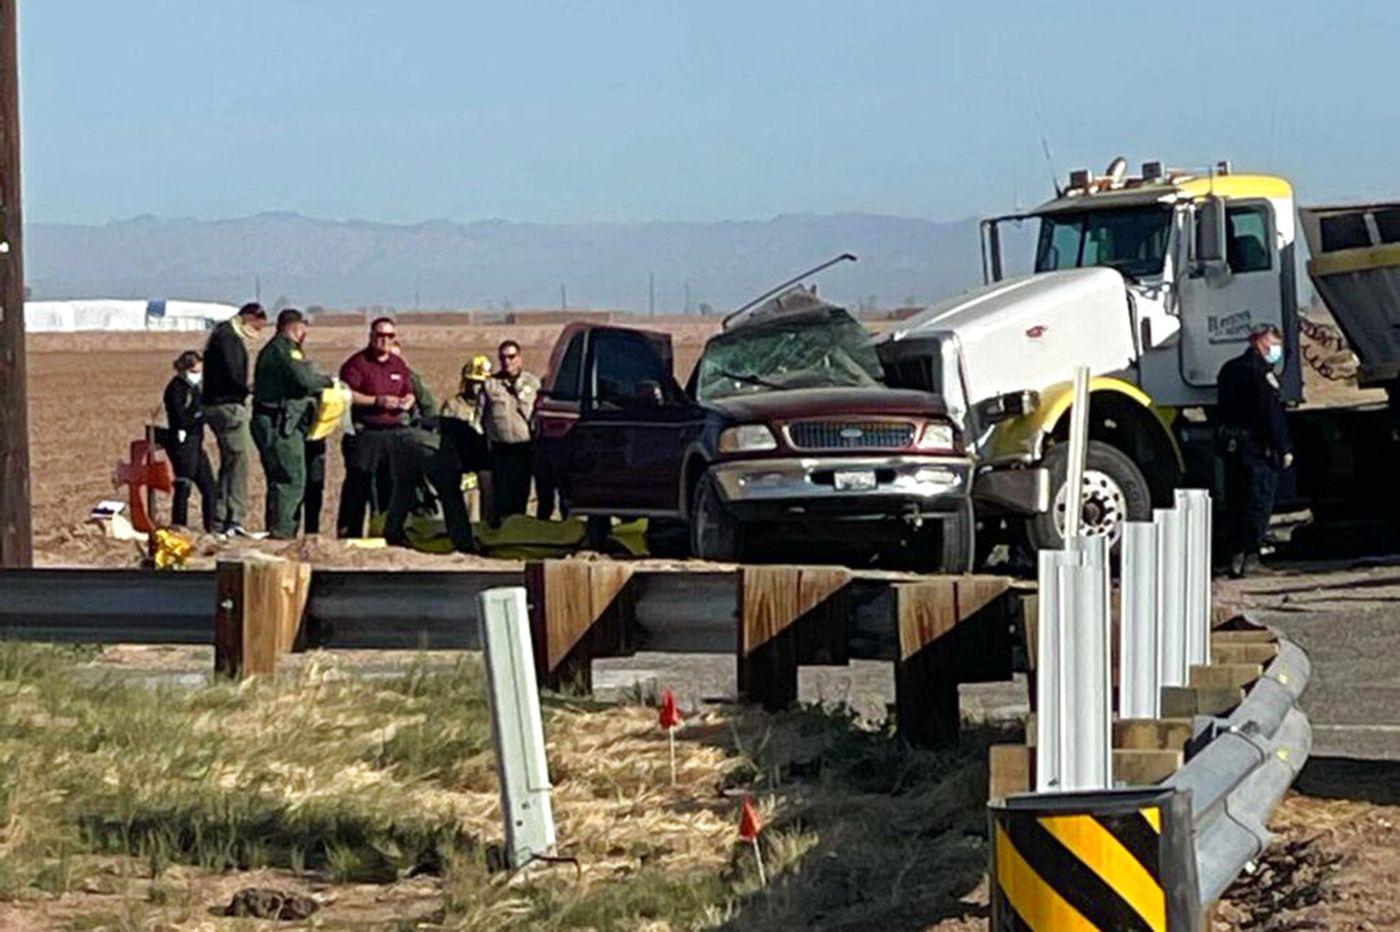 Guatemala woman, 23, is among 13 killed in California crash